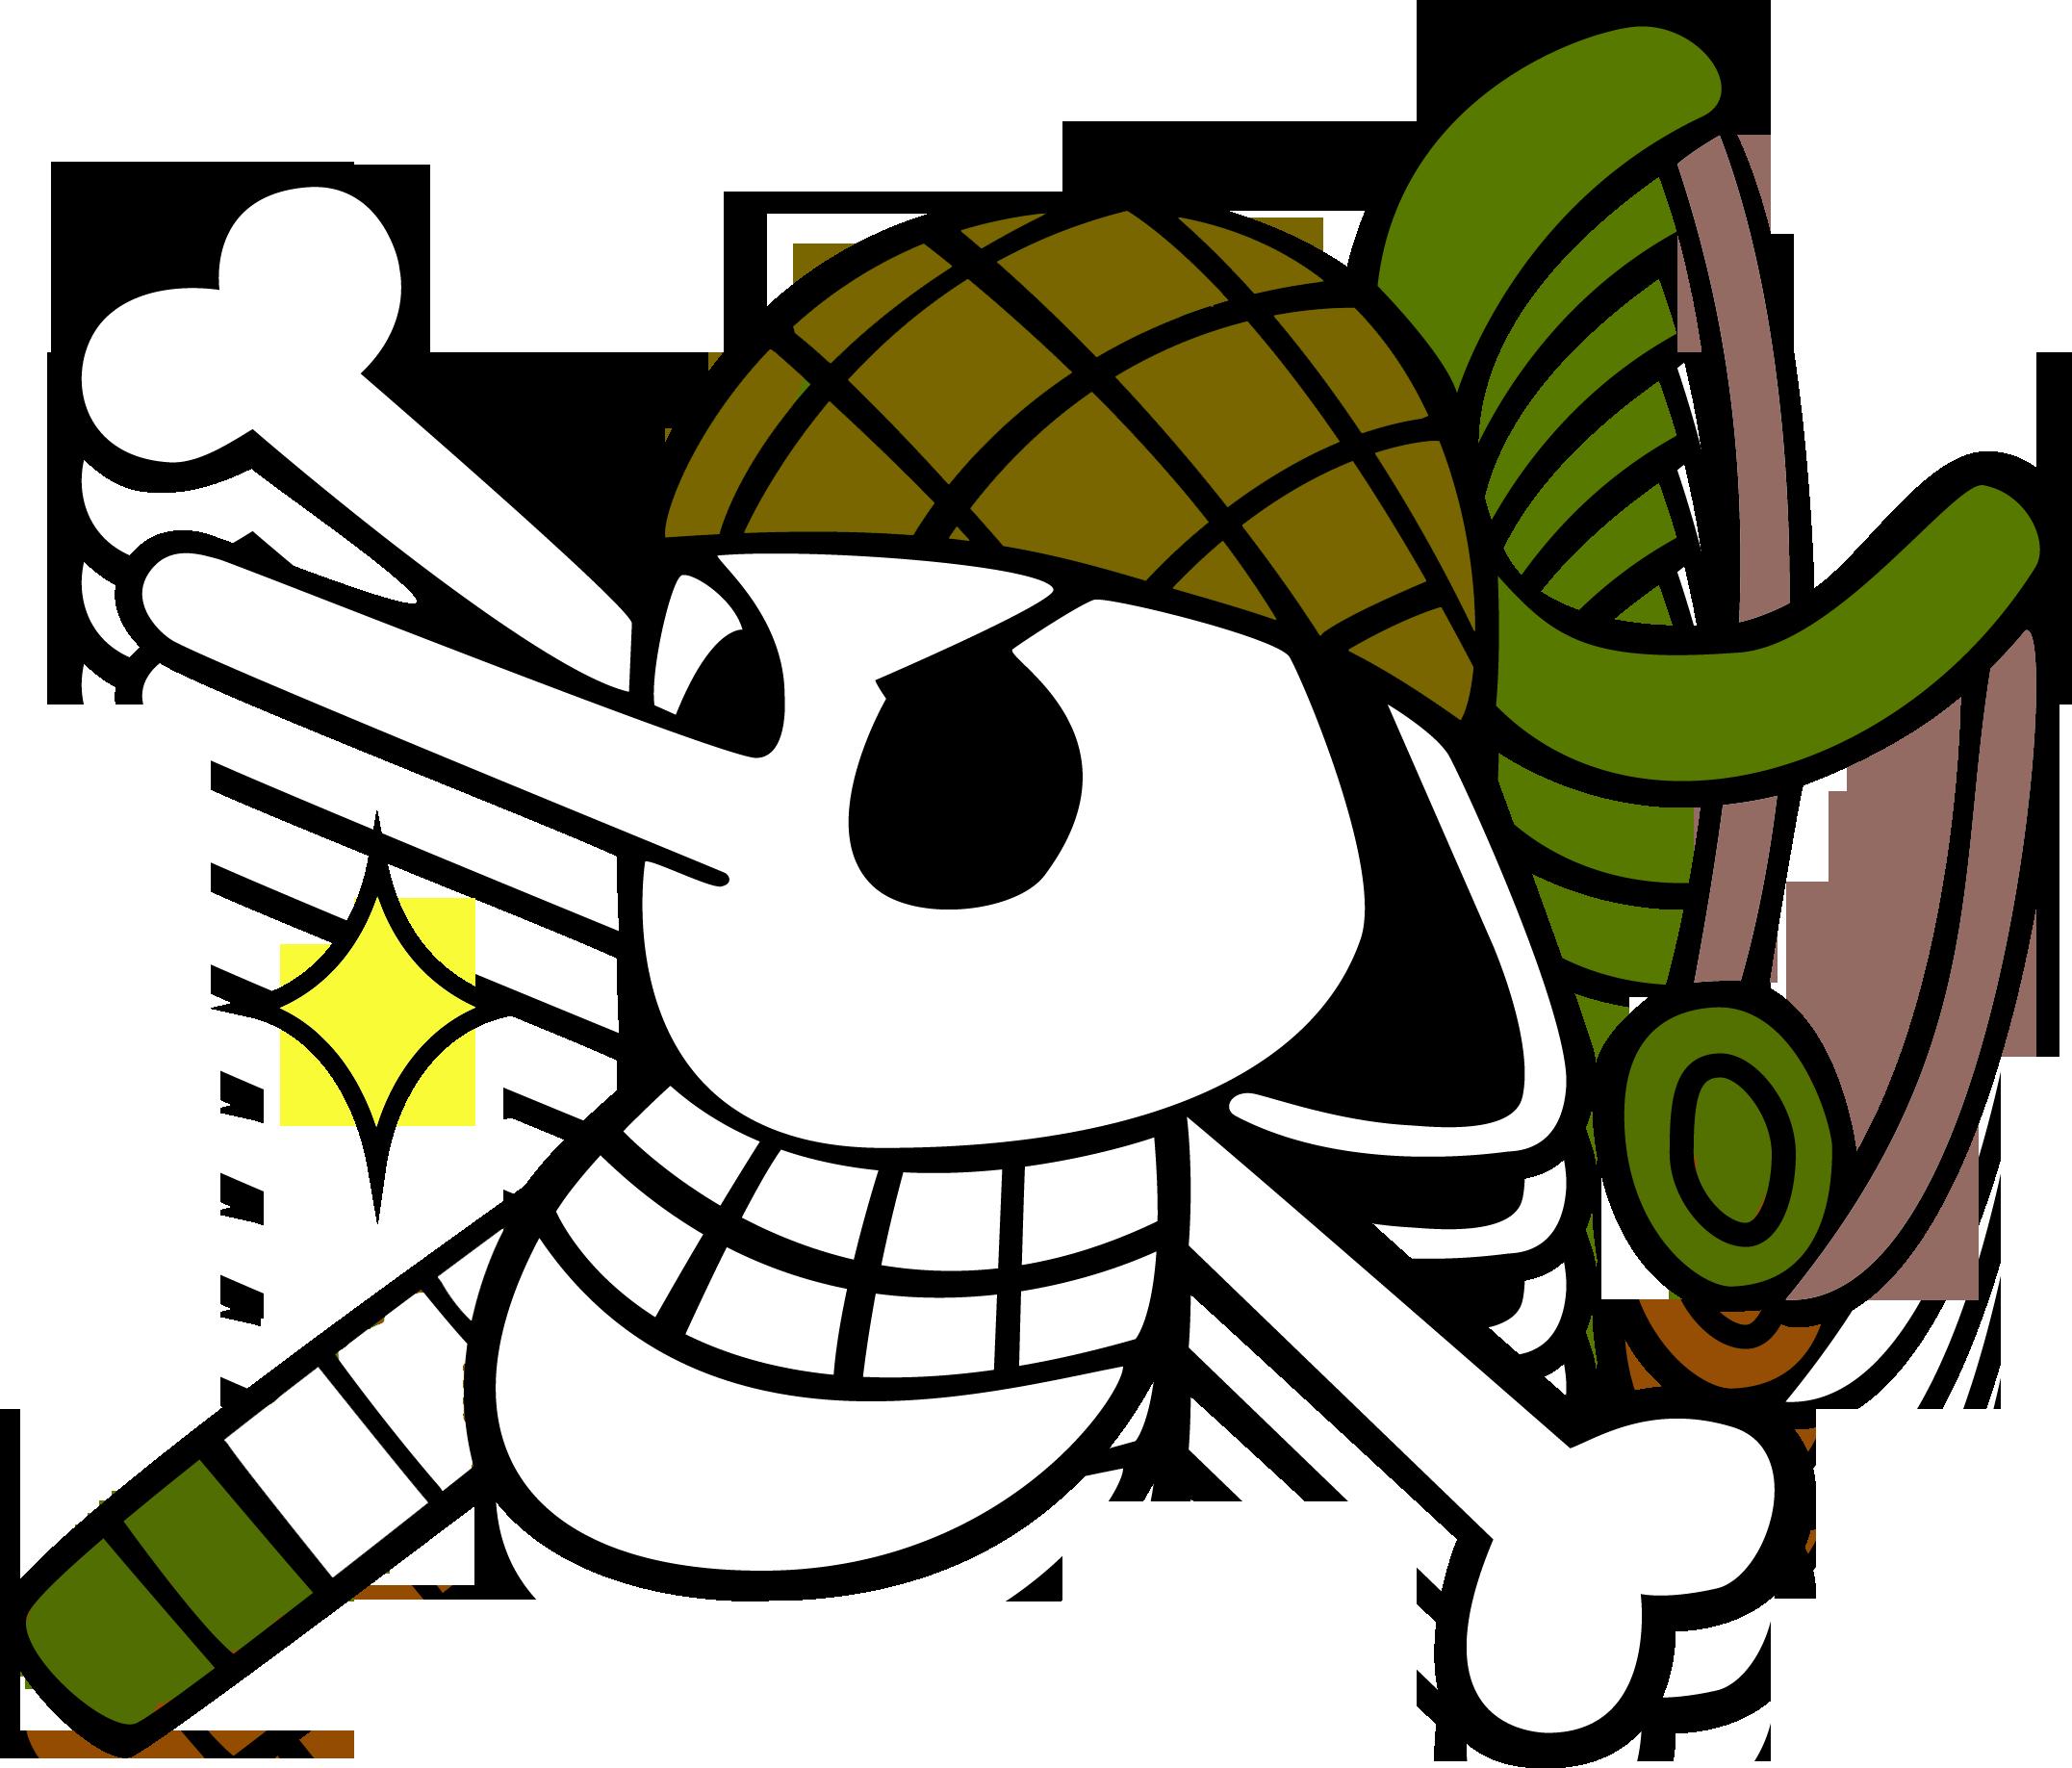 Usopp Flag - One Piece by Sanji-Devastador on DeviantArt